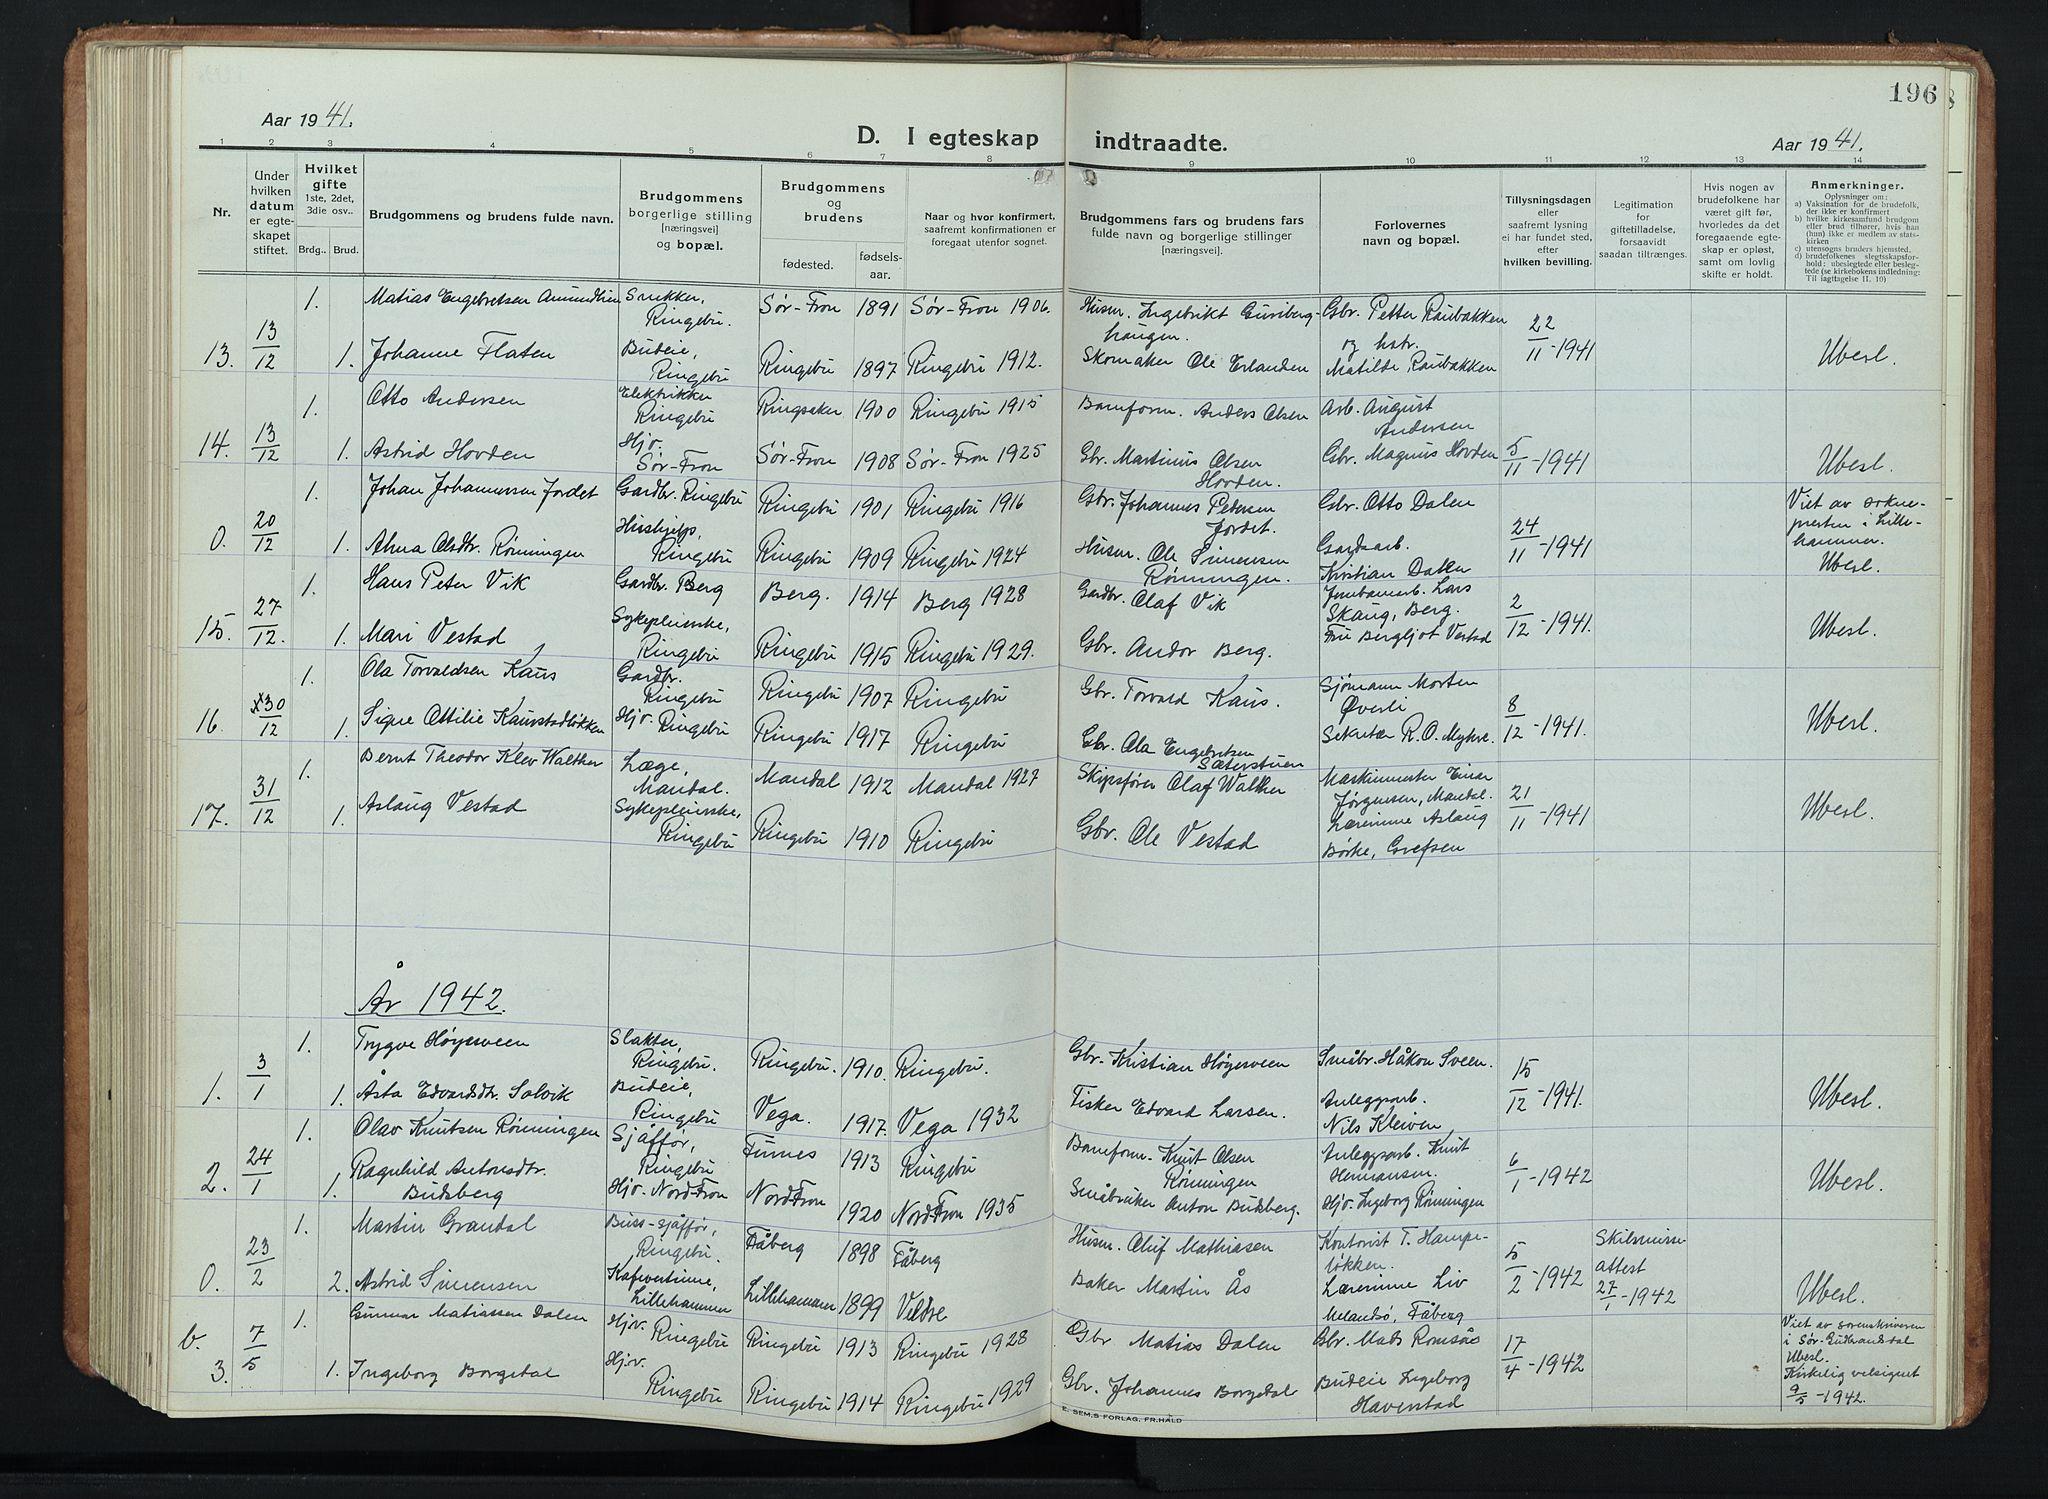 SAH, Ringebu prestekontor, Klokkerbok nr. 11, 1921-1943, s. 196